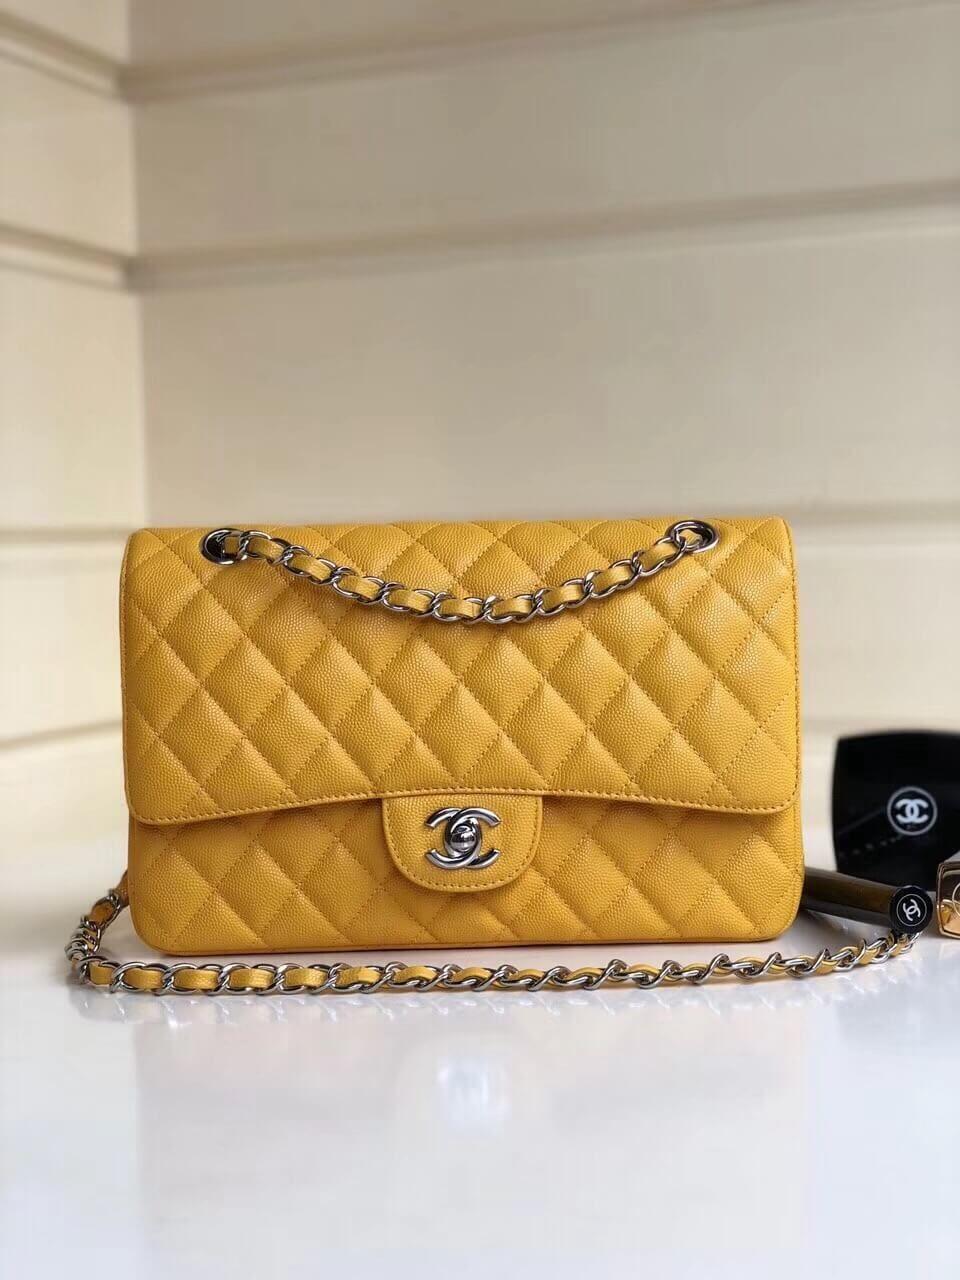 Chanel Grained Calfskin Medium Classic Flap Bag A1112 Yellow ... c386147ec2e91